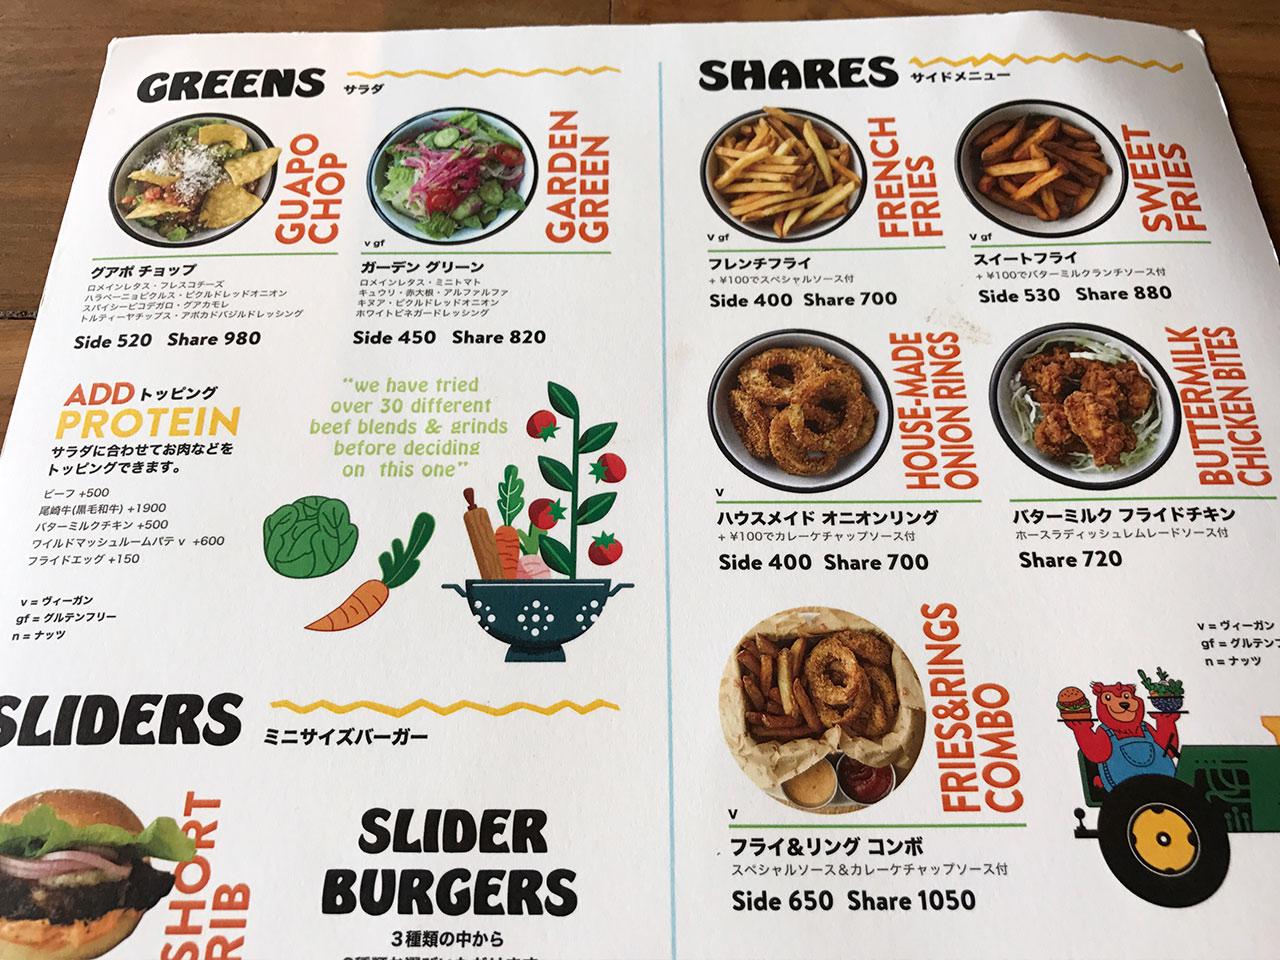 Bareburgerのサイドメニュー